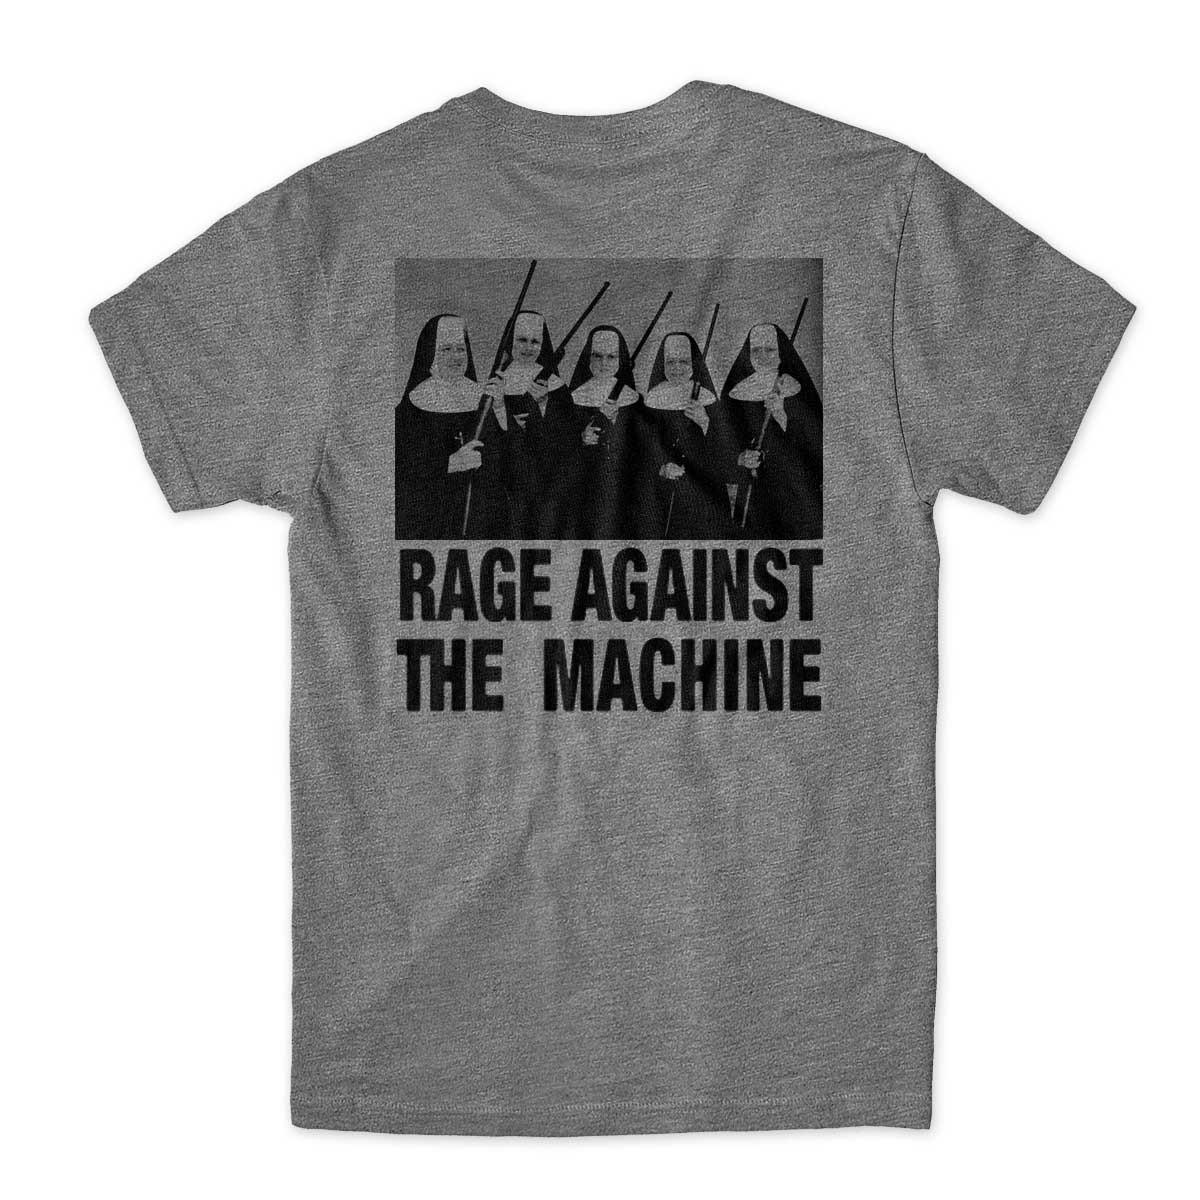 Camiseta Rage against the machine costas freiras armadas